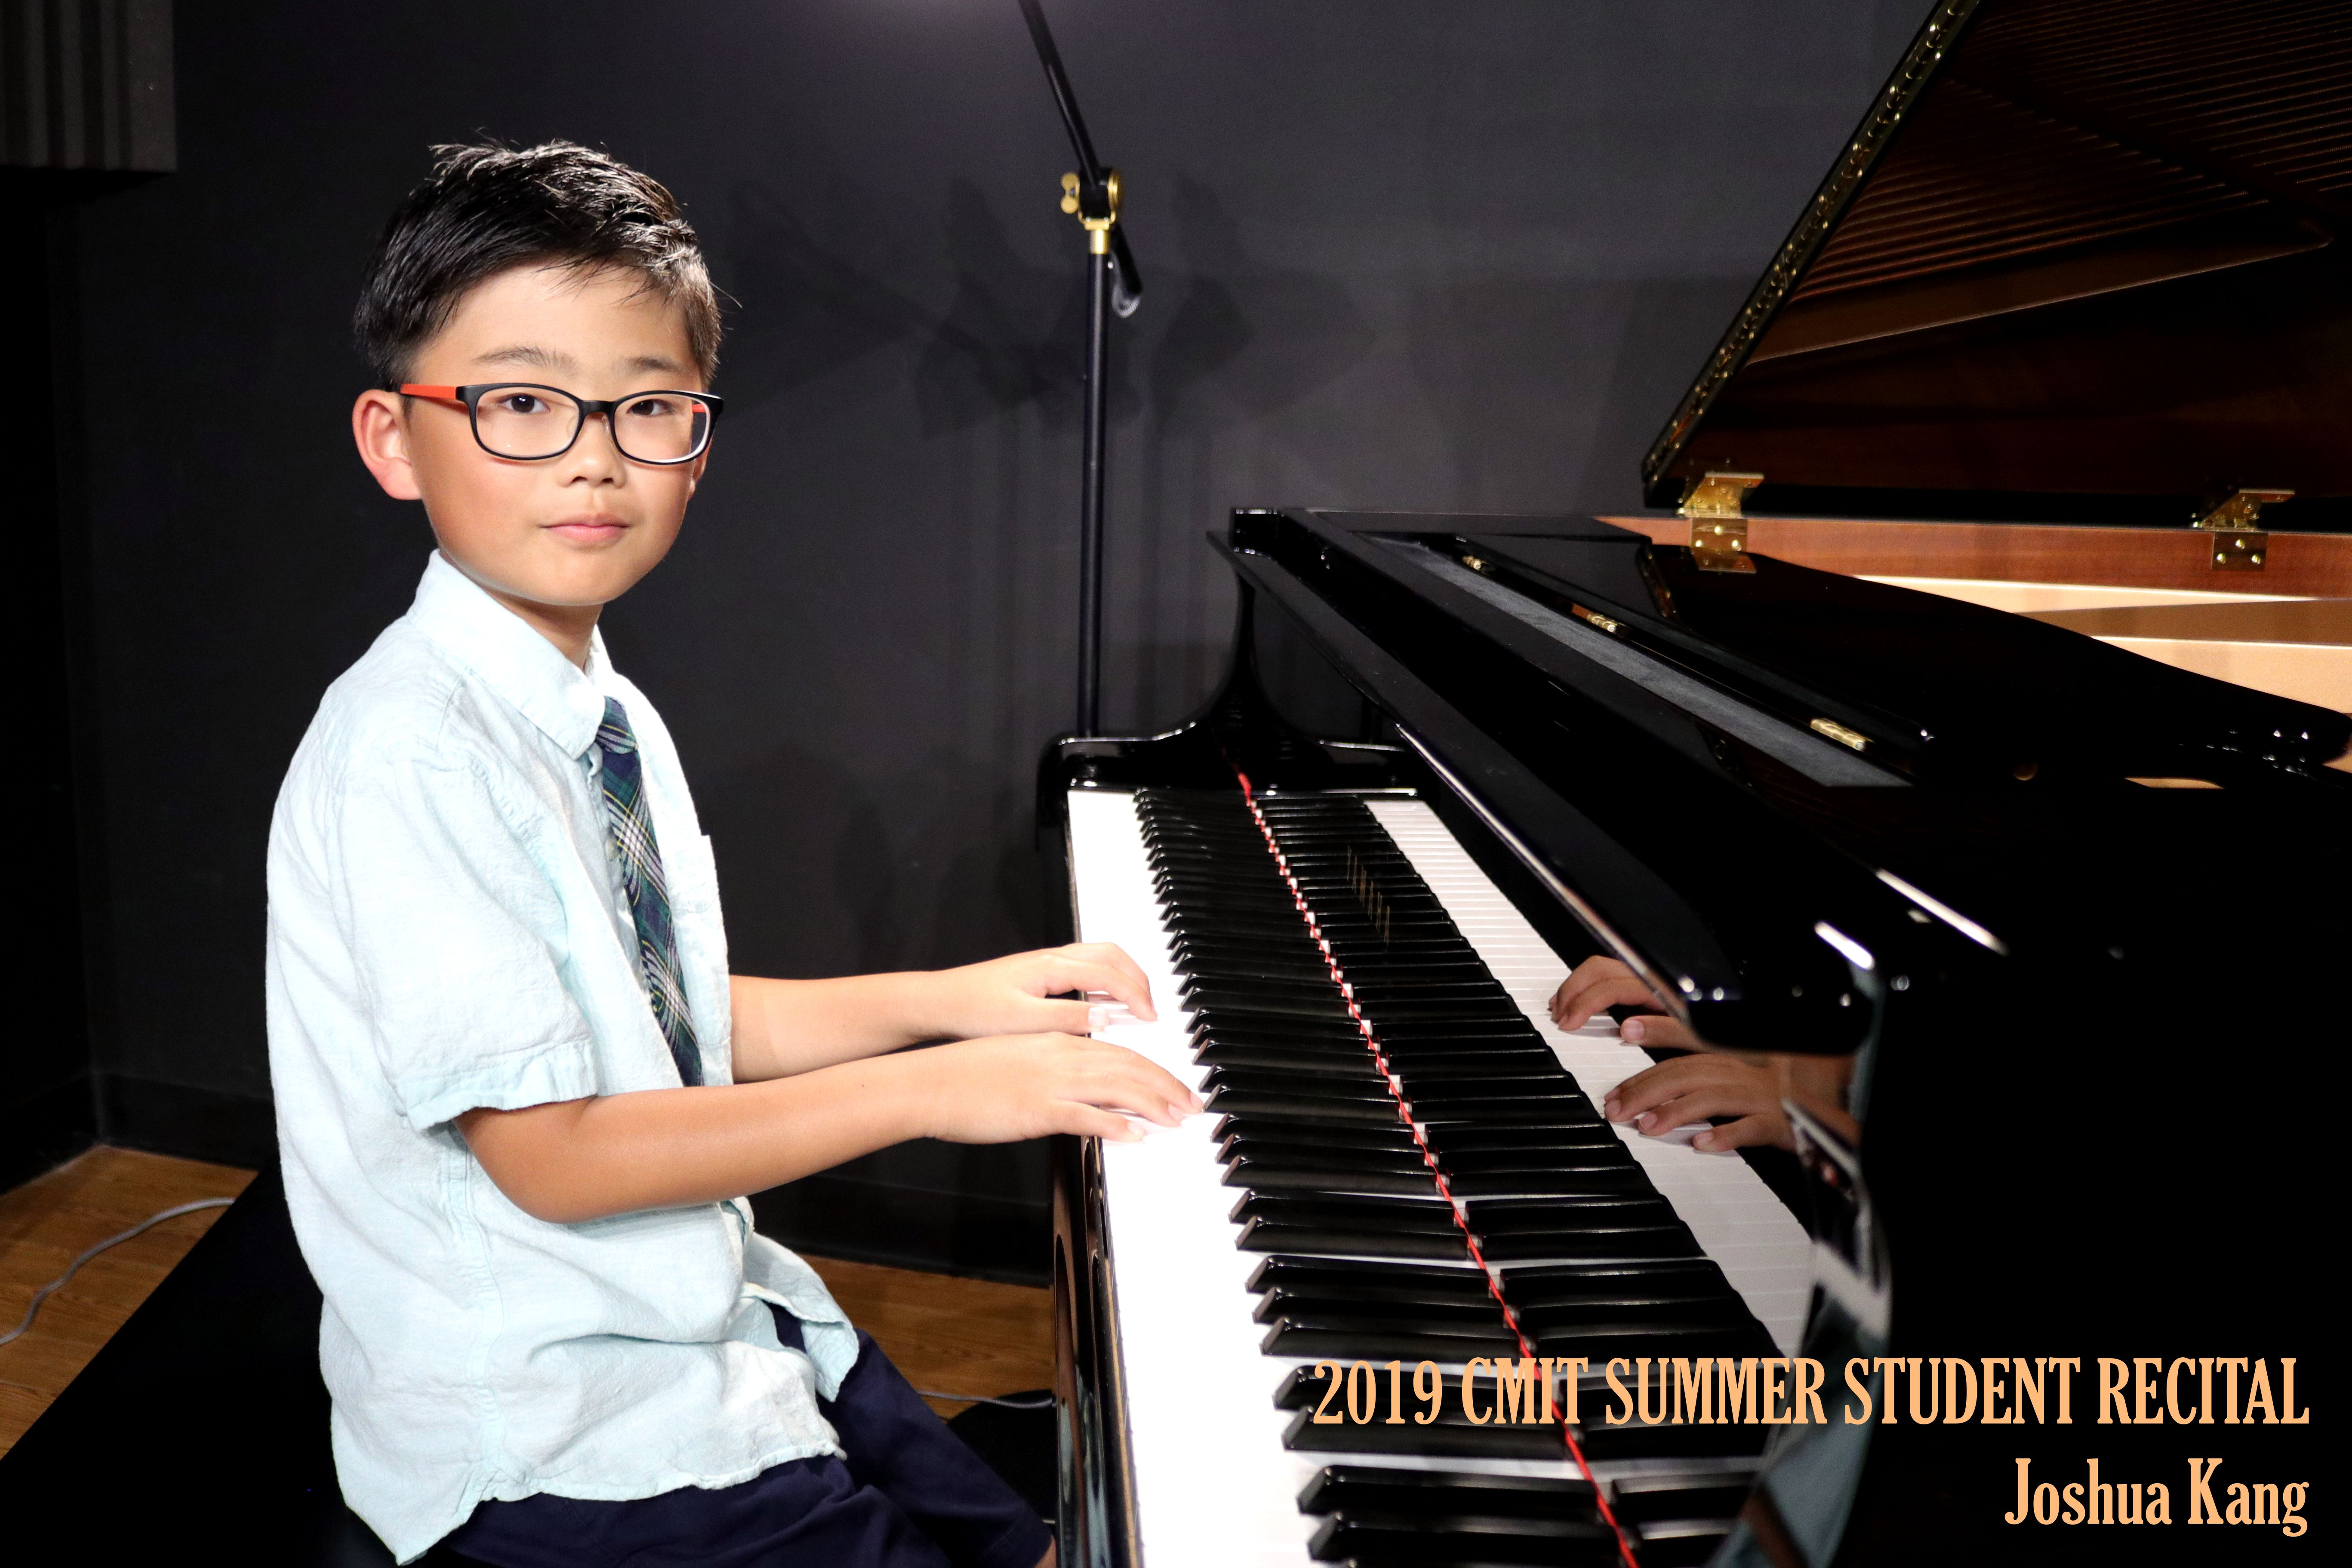 06 Joshua Kang